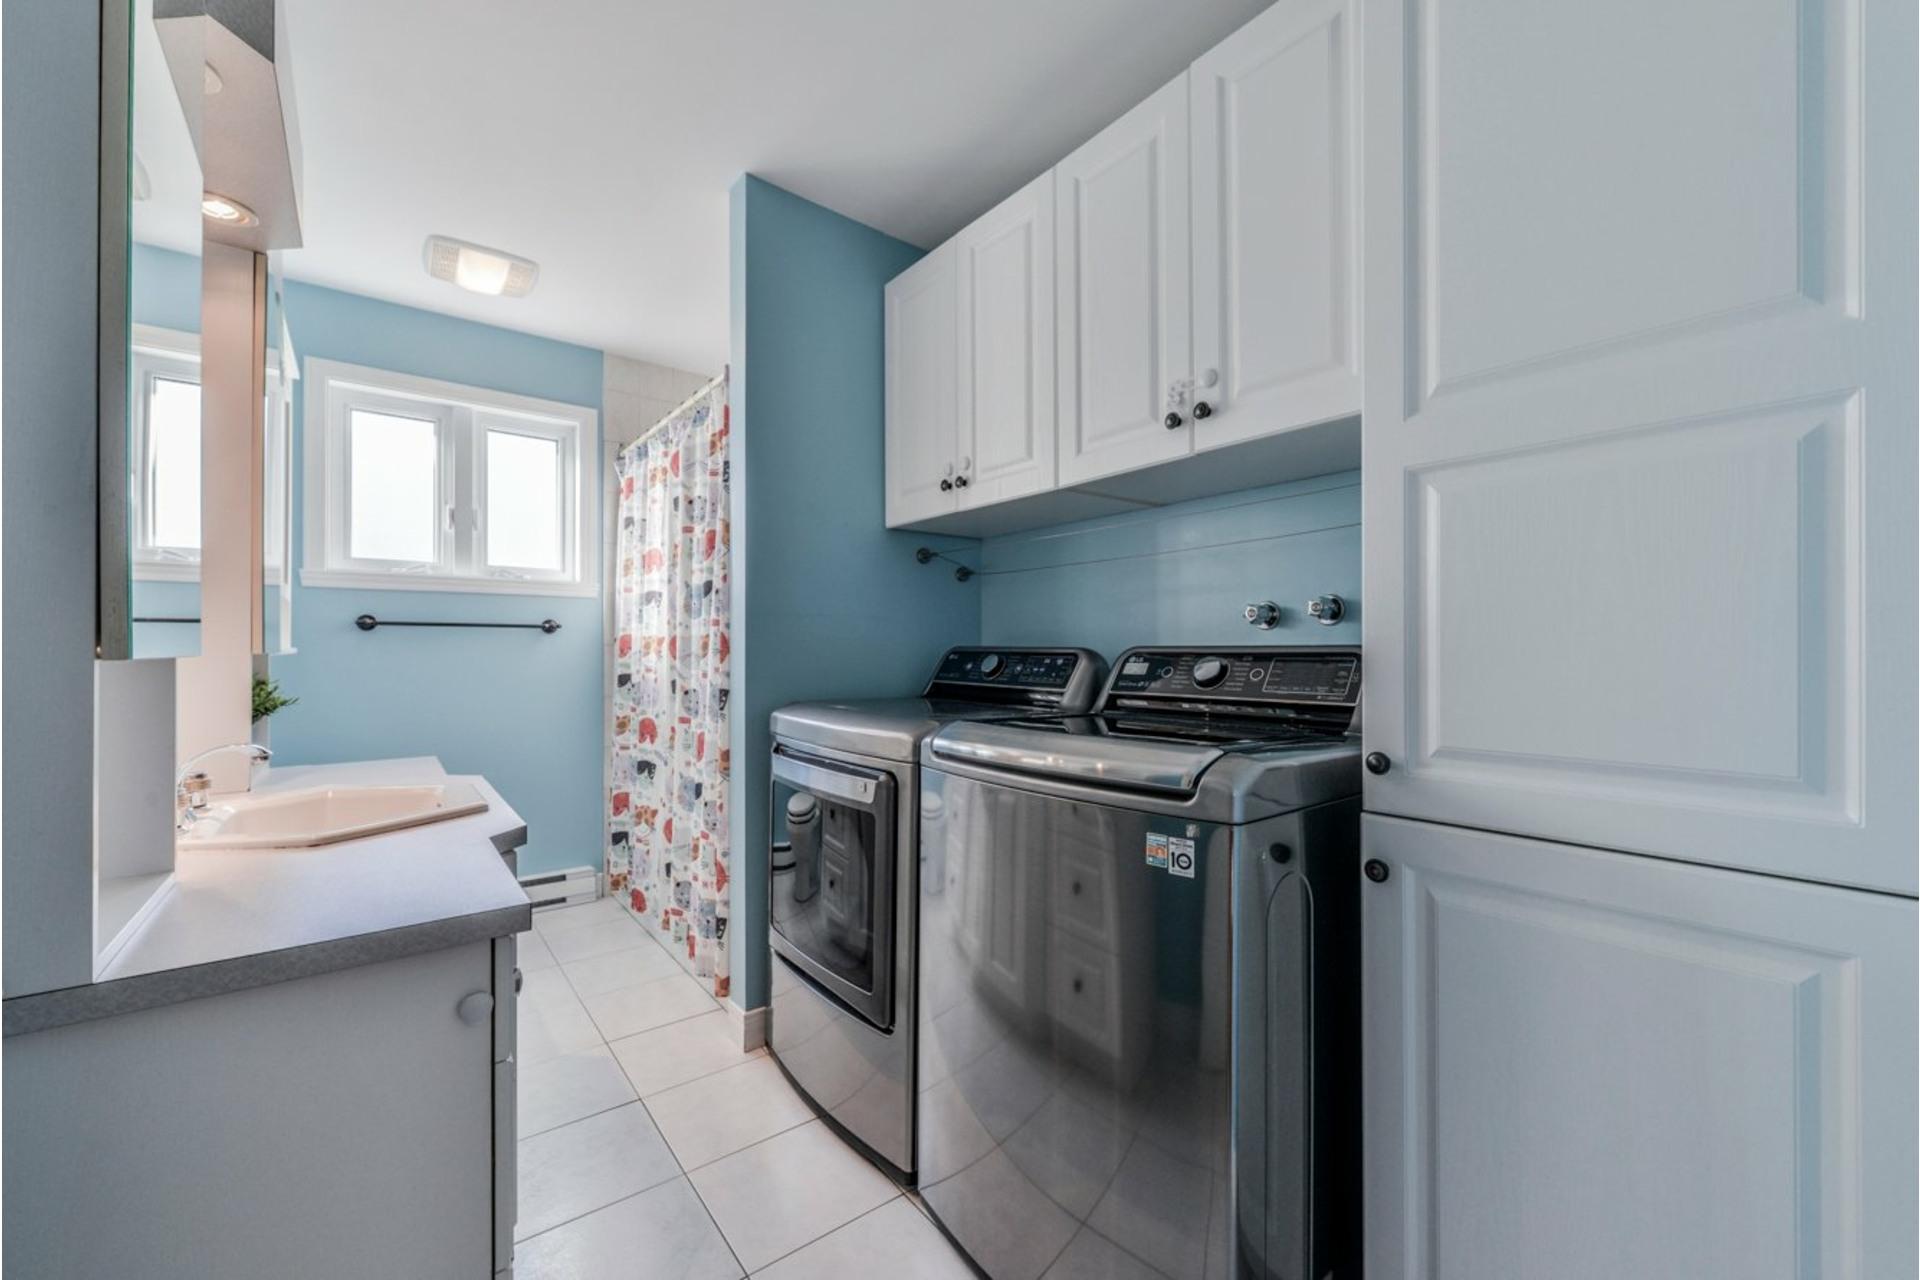 image 12 - House For sale Saint-Basile-le-Grand - 7 rooms